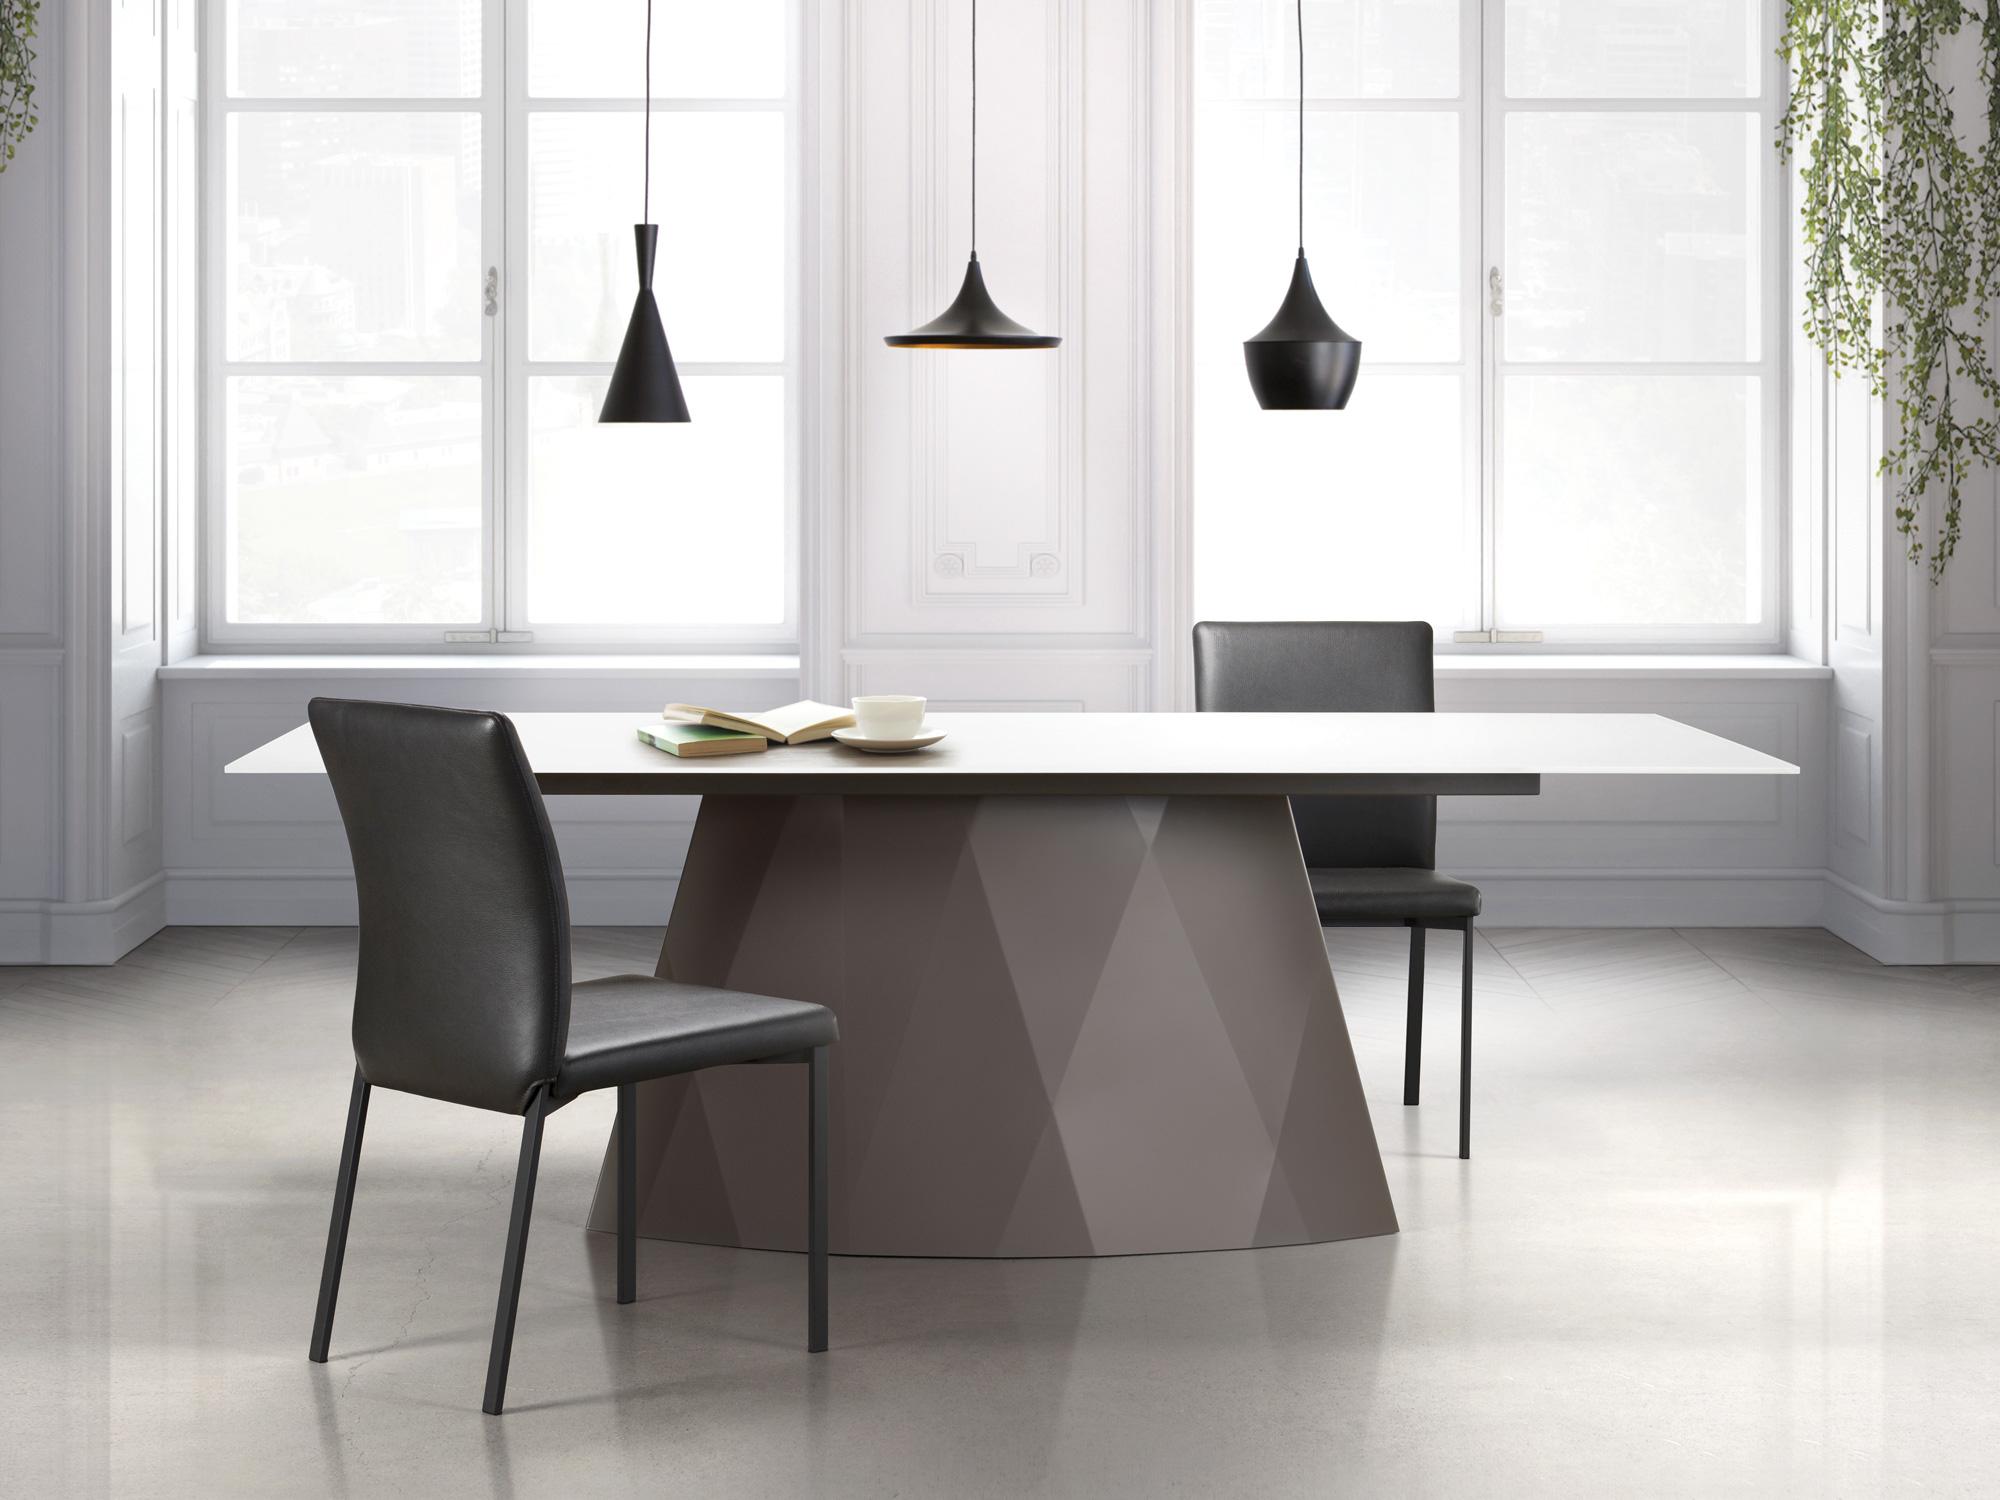 Diamond-table-with-Mancini-chairs.jpg